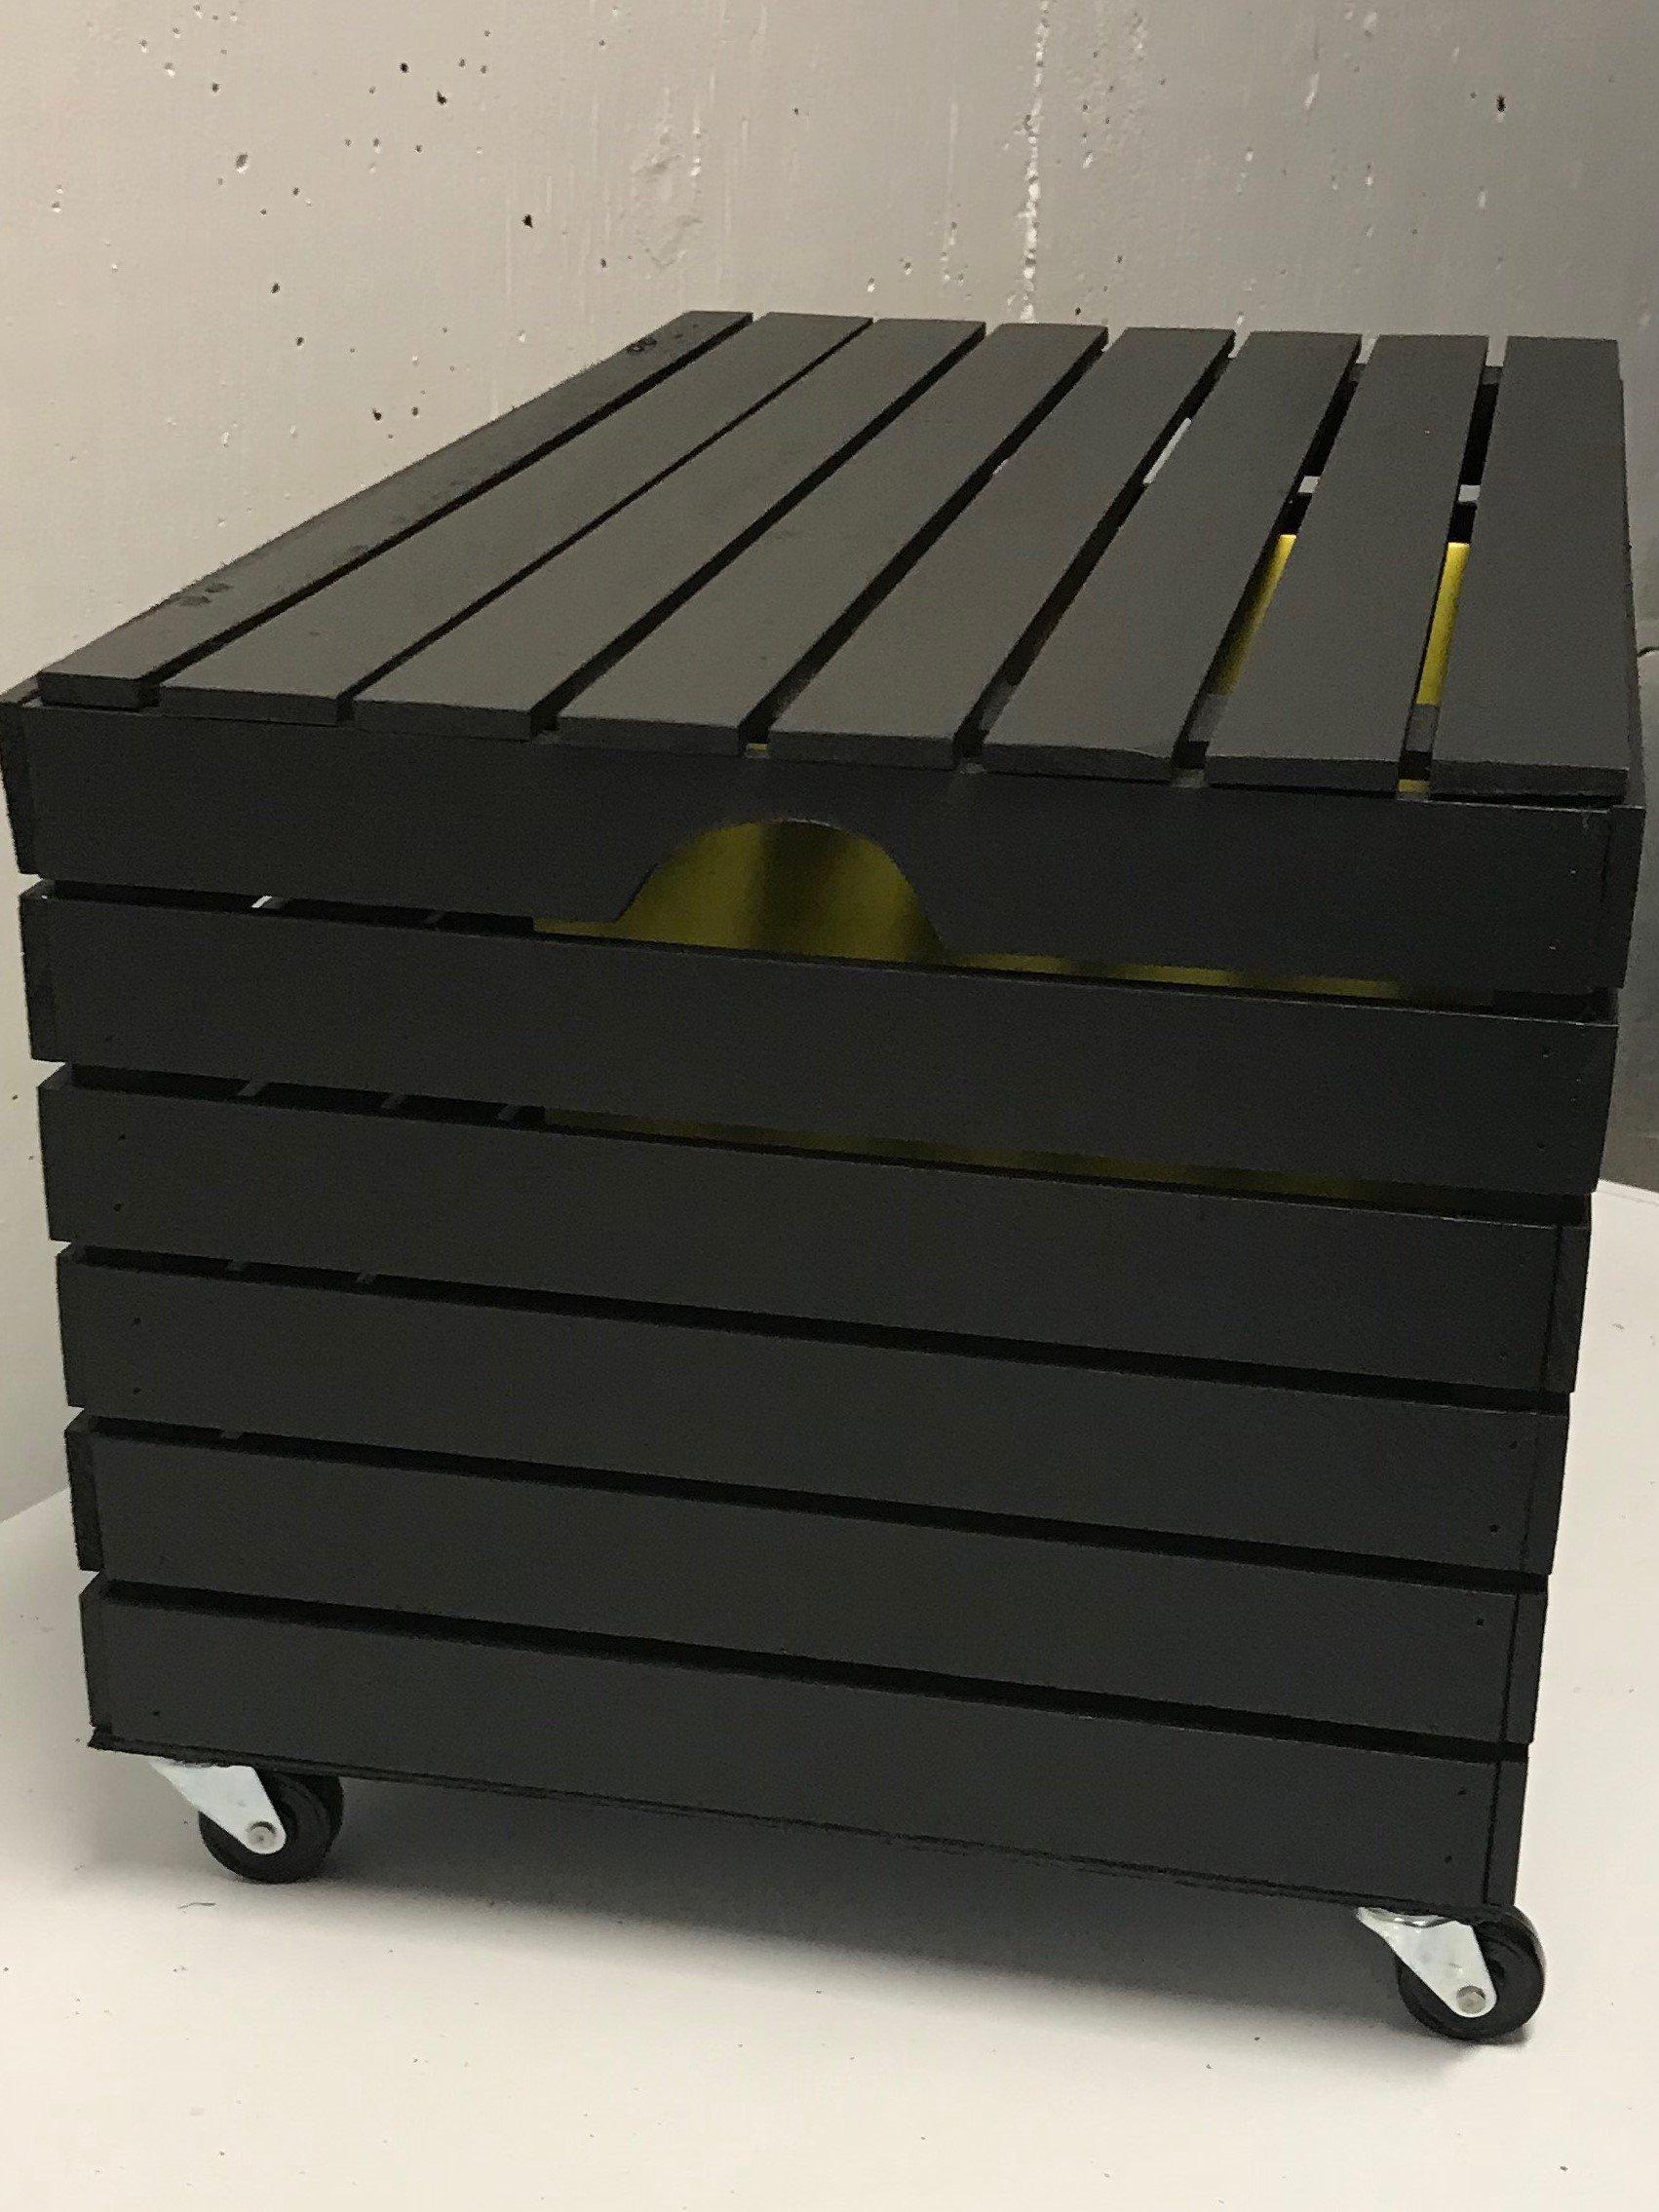 At Home On Main File Cabinet/Decorative Storage Box (Black Onyx)